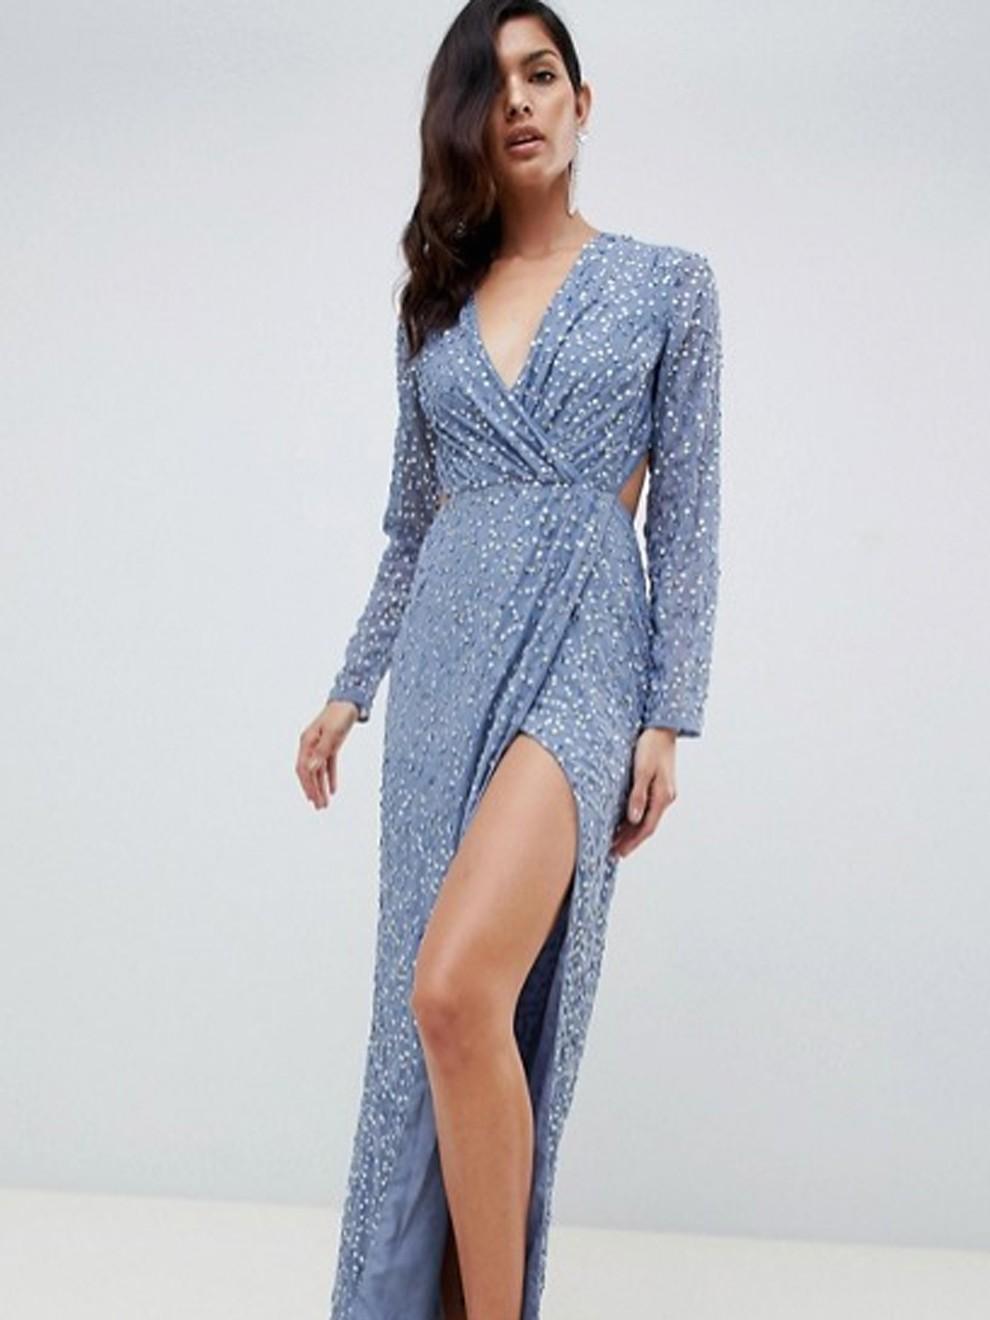 Derrocha estilo con un vestido de pedrería de Asos por 109'99 euros